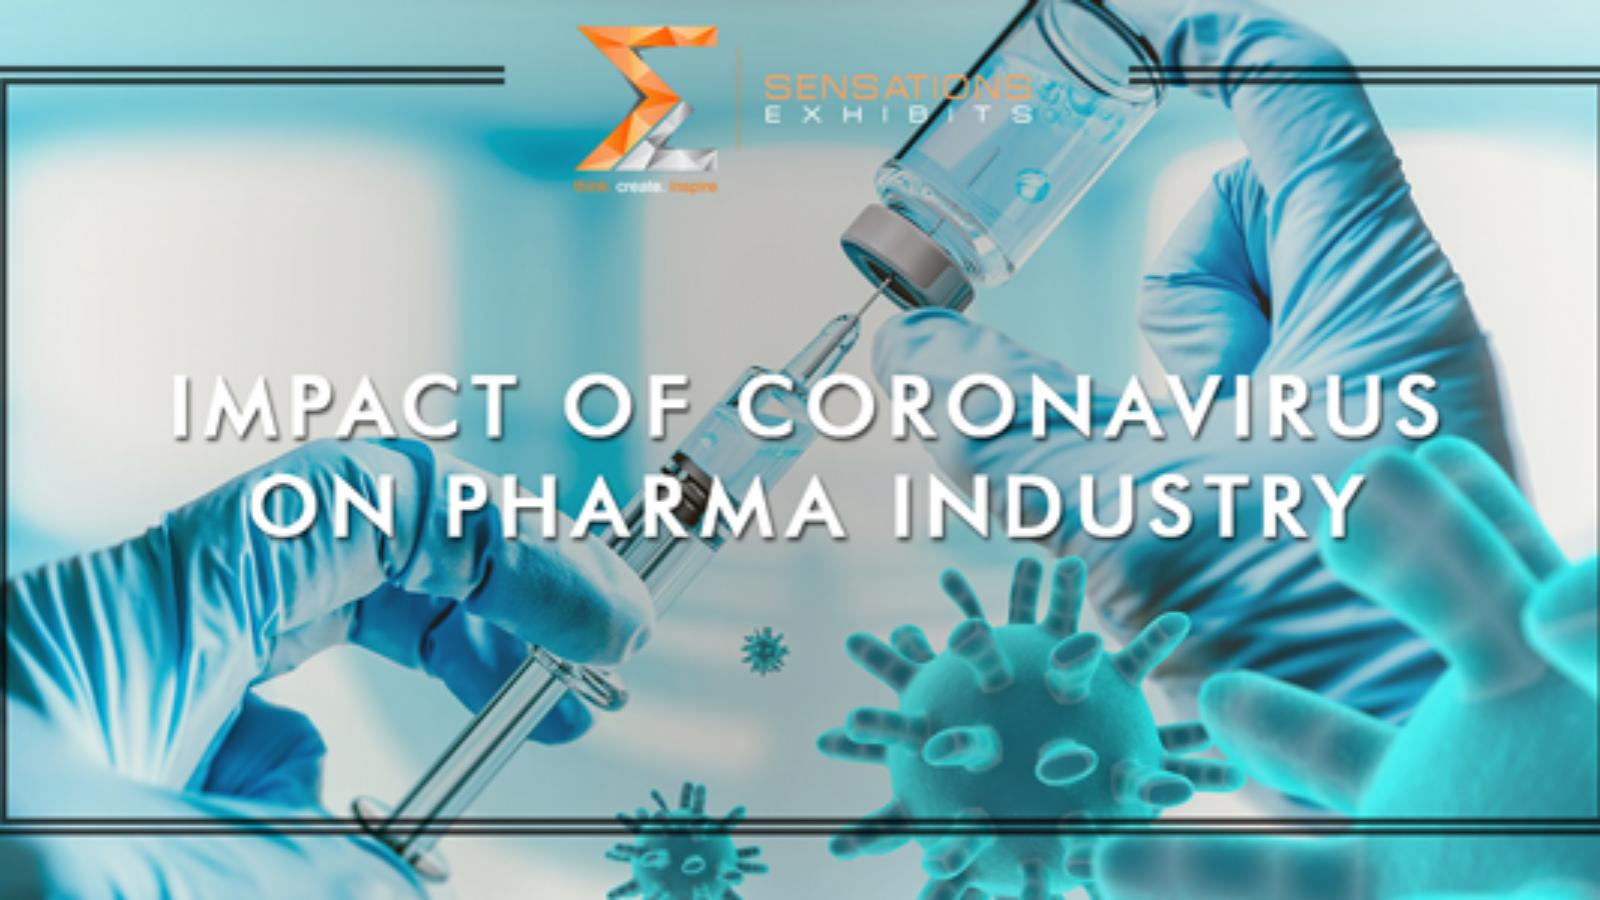 Impact Of Coronavirus On Pharma Industry